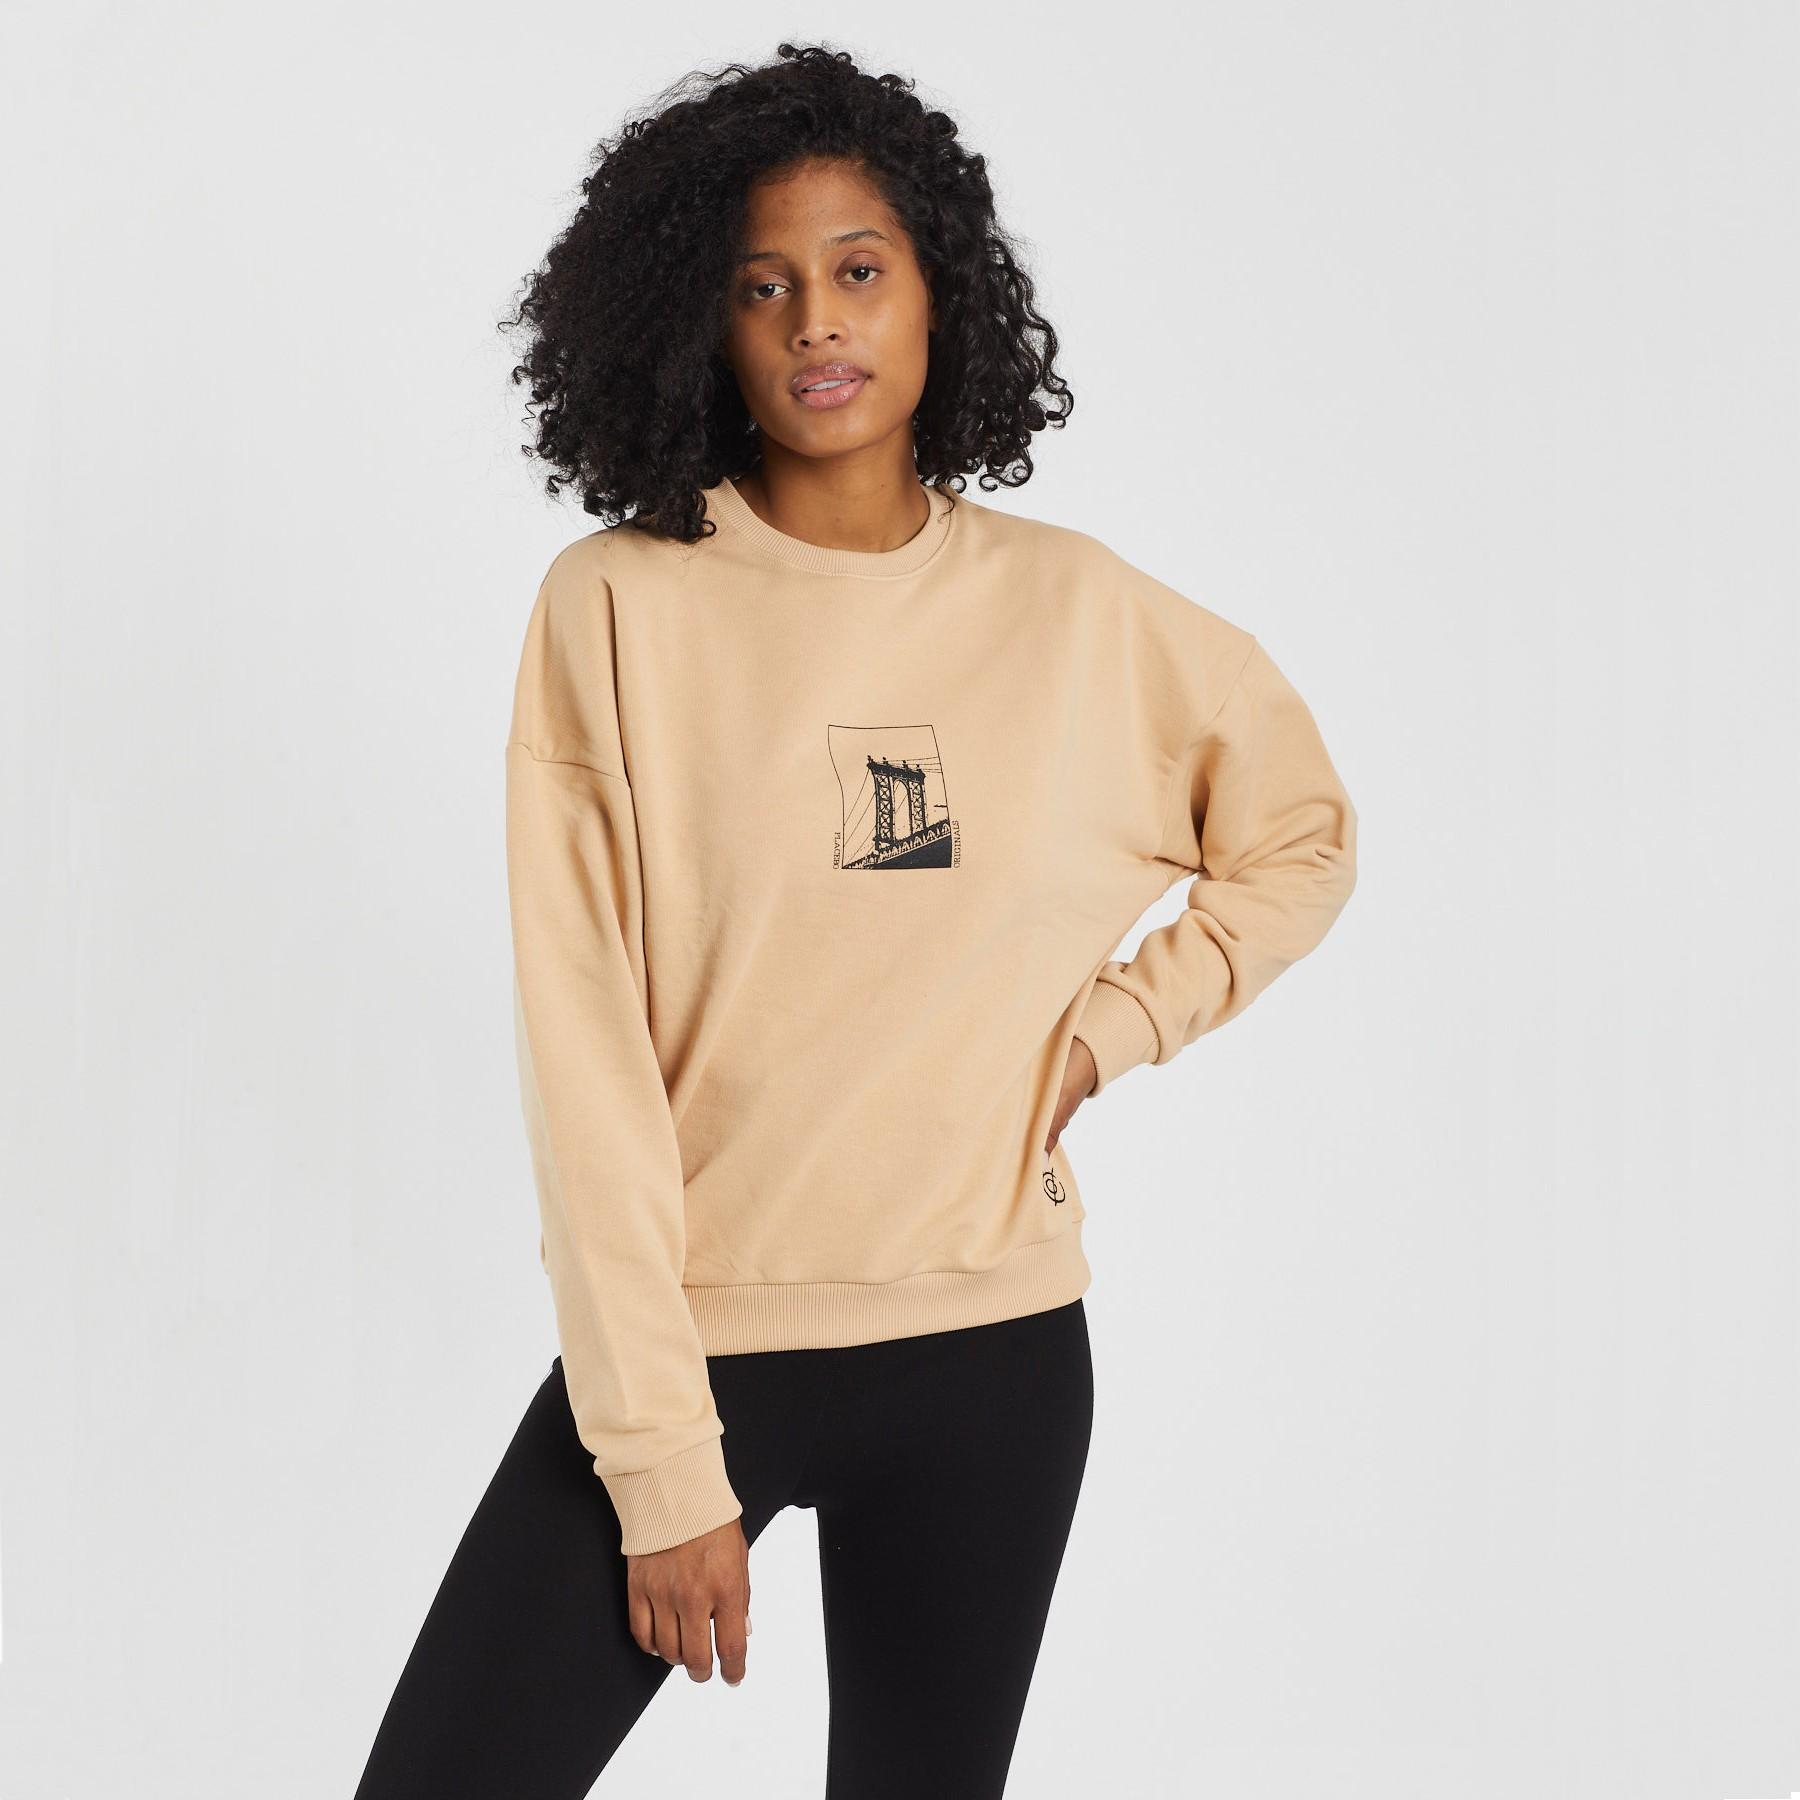 Lean Against The Sky Unisex Sweatshirt